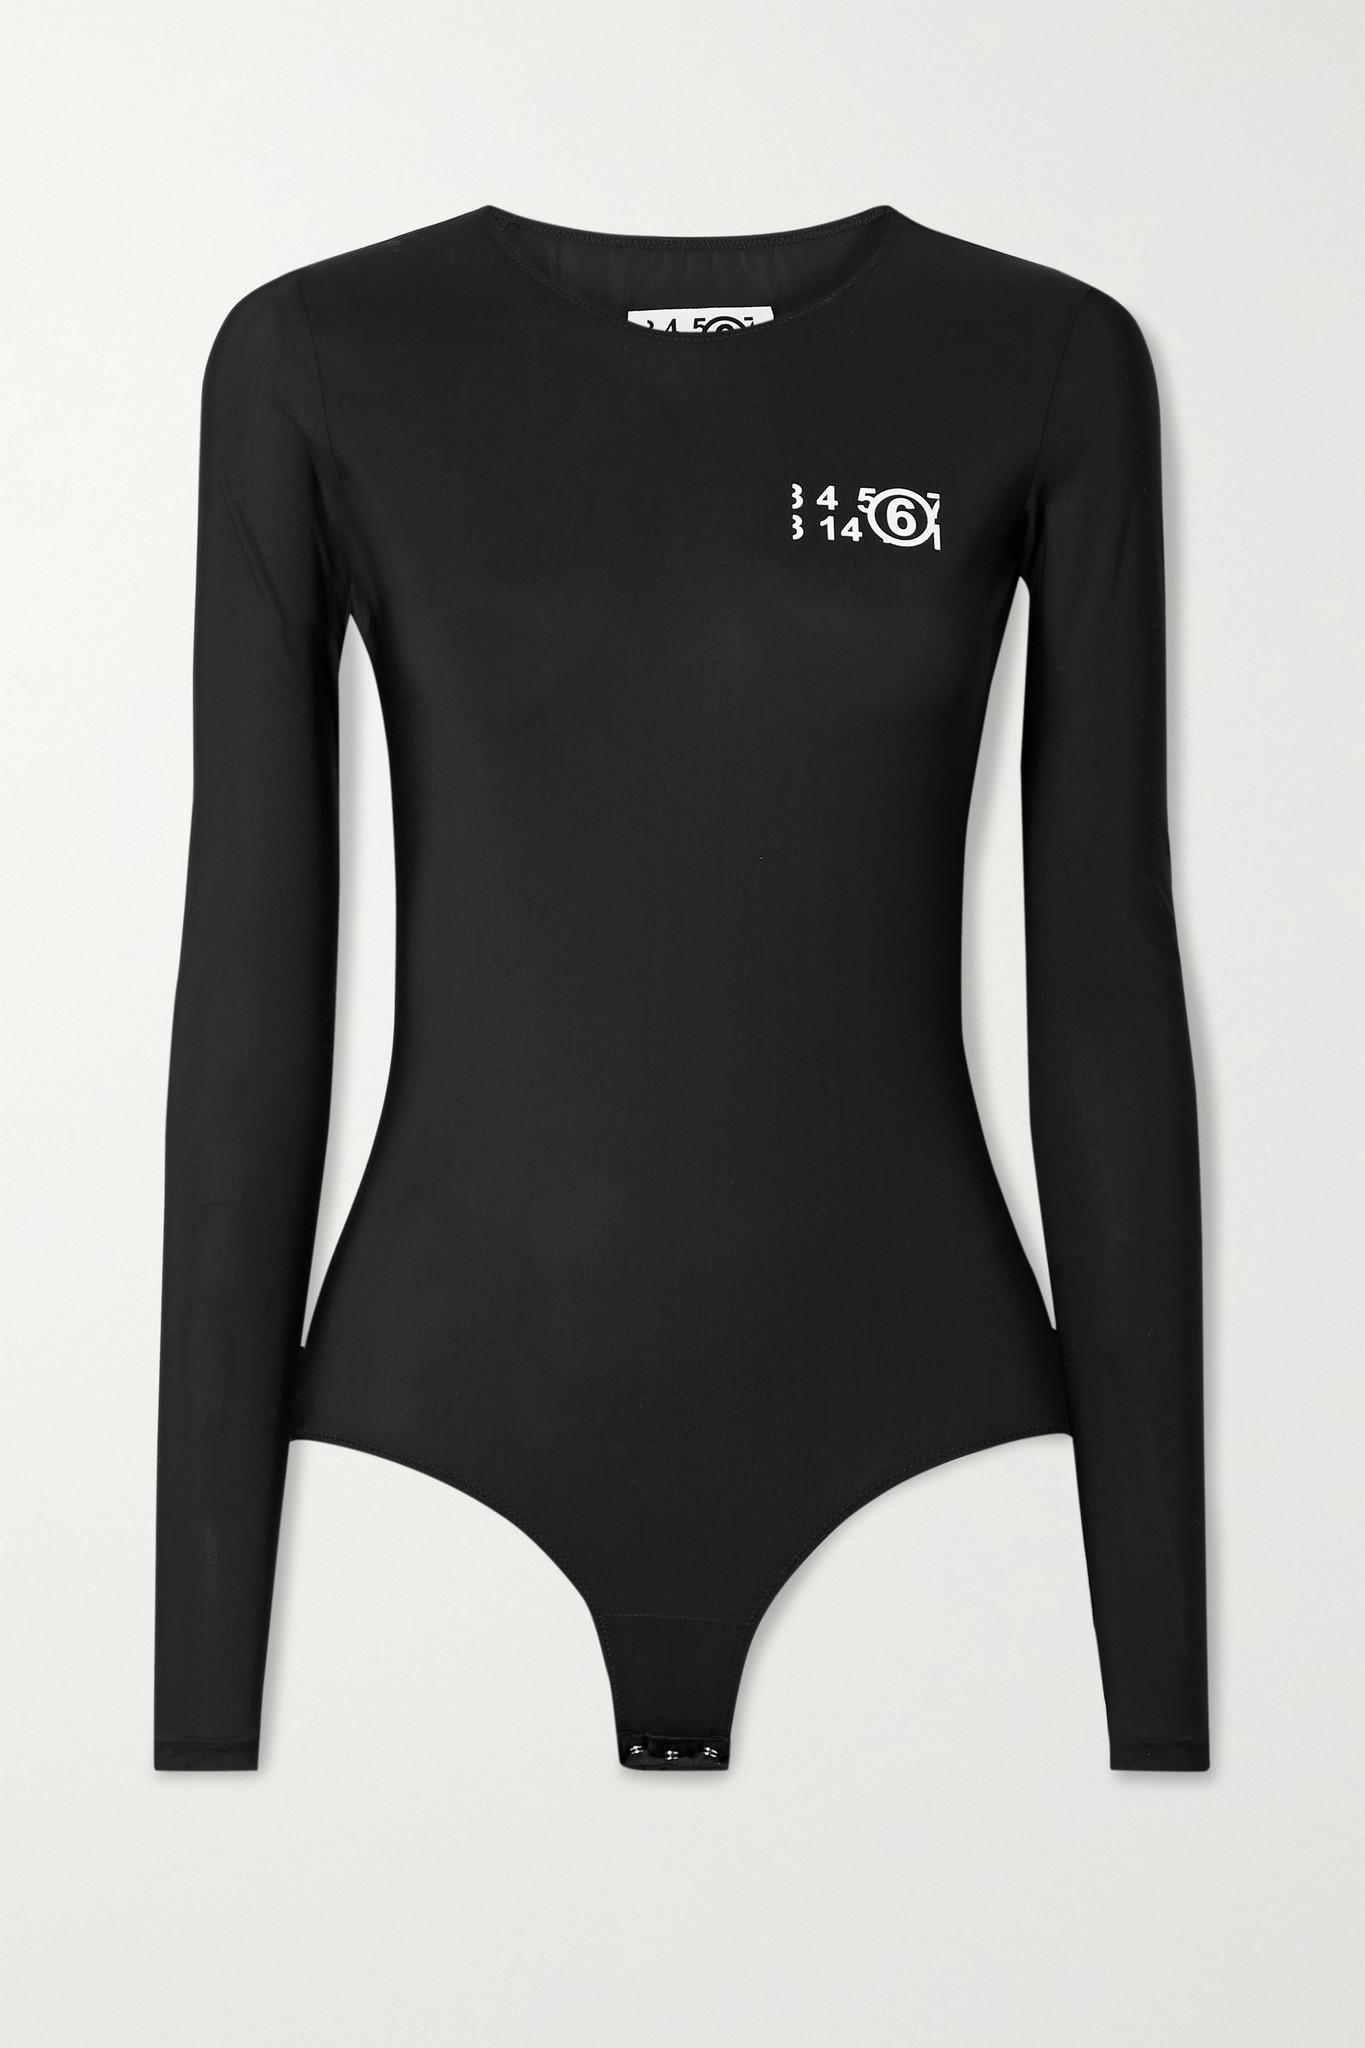 MM6 MAISON MARGIELA - Printed Stretch-jersey Bodysuit - Black - small